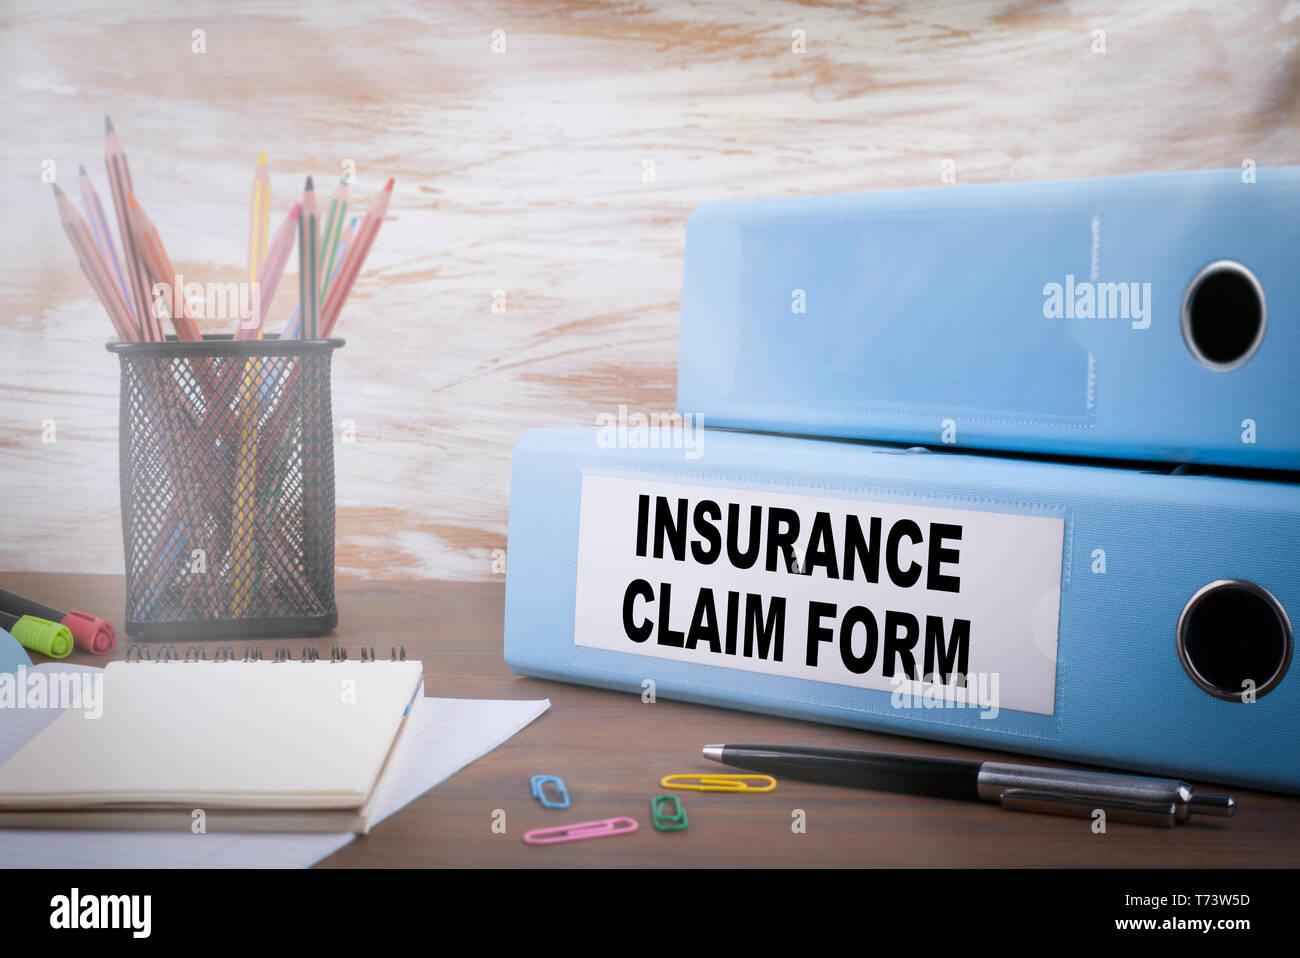 Insurance Claim Form, Office Binder on Wooden Desk - Stock Image